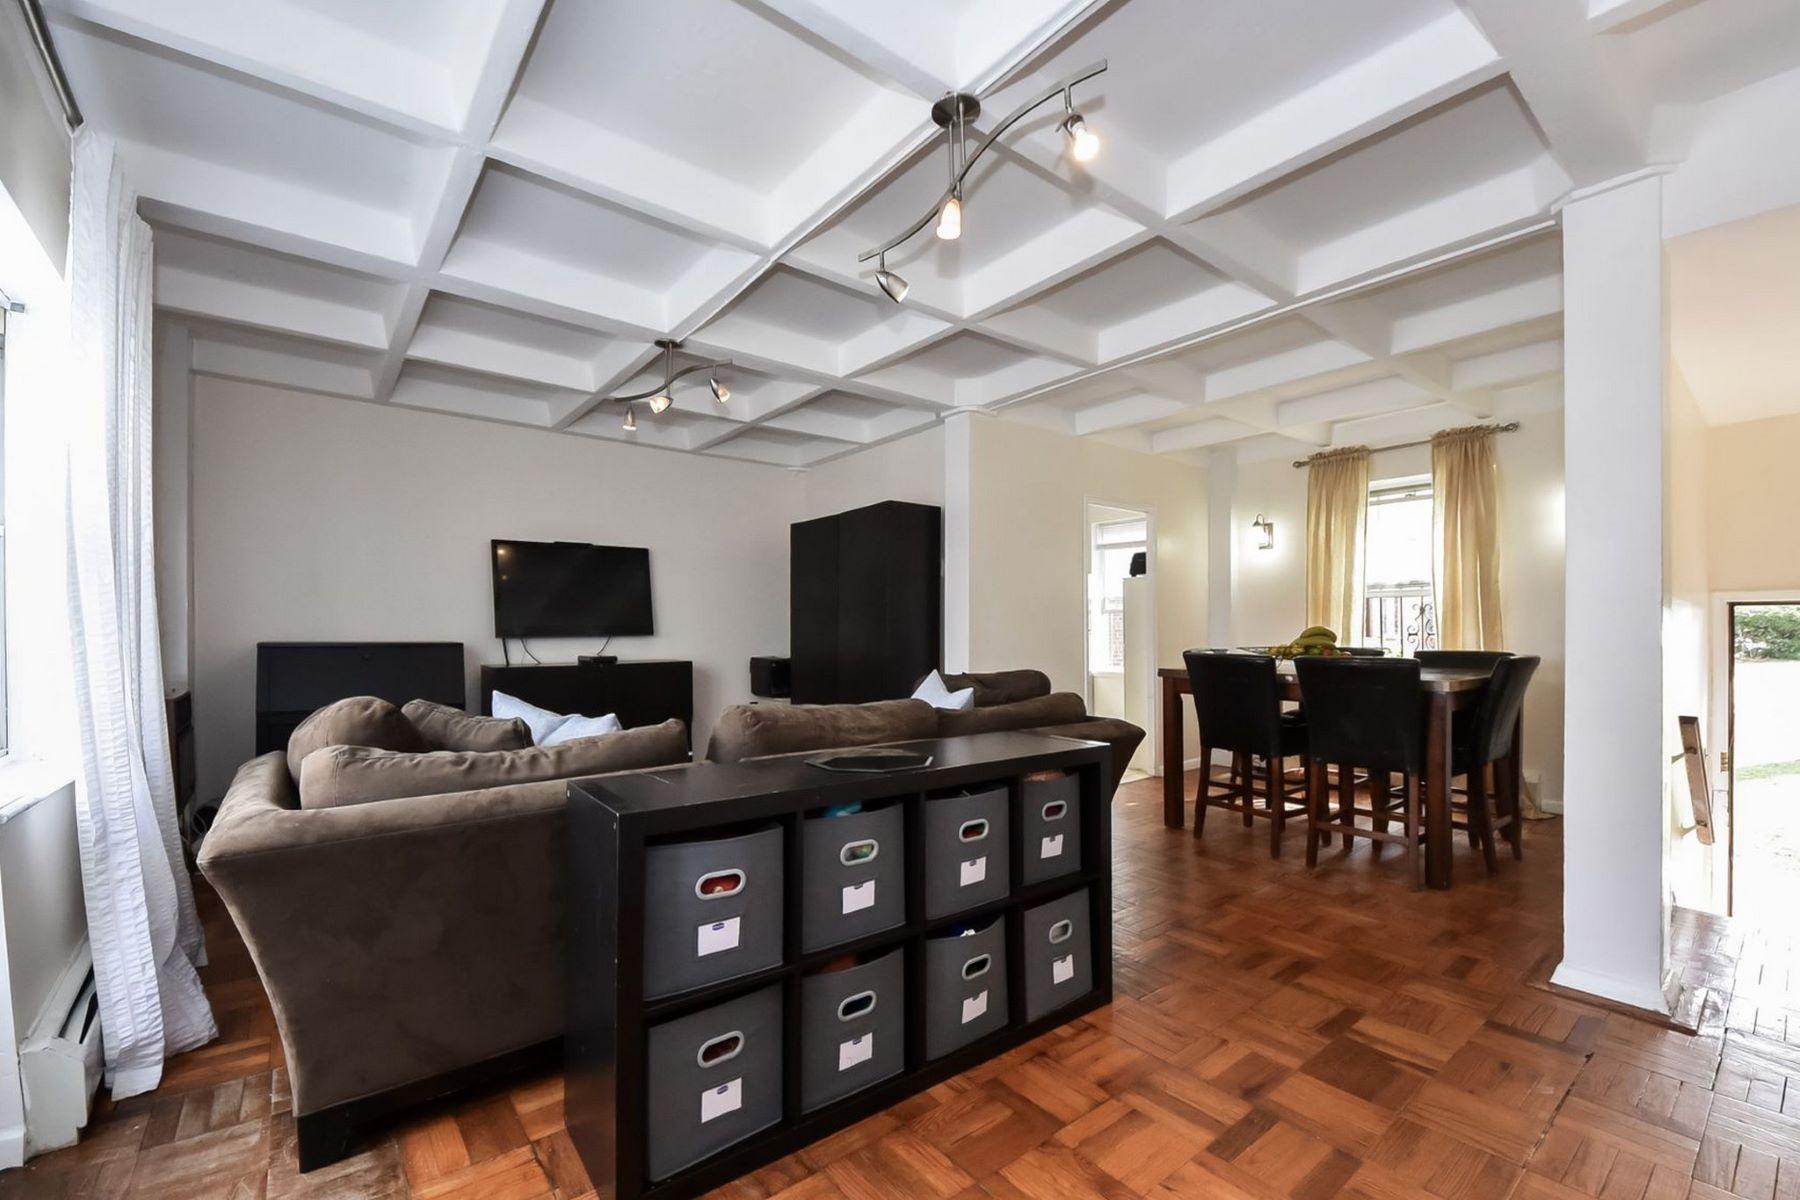 合作公寓 为 销售 在 147-49 Charter Rd , 21C, Kew Garden Hills, NY 1136 147-49 Charter Rd 21C Flushing, 纽约州 11367 美国